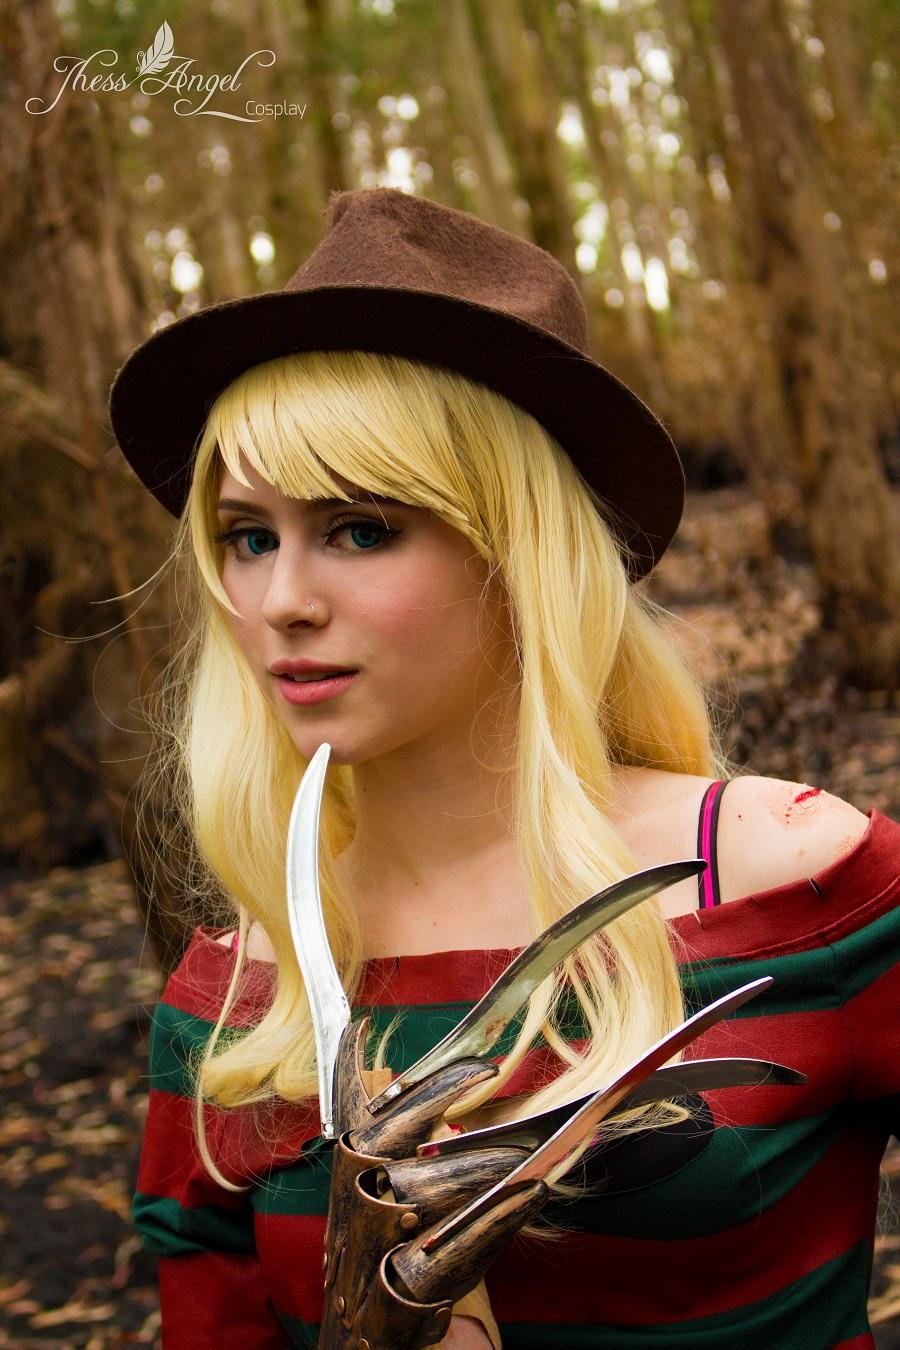 Freddy-Bishoujo-cosplay (2)